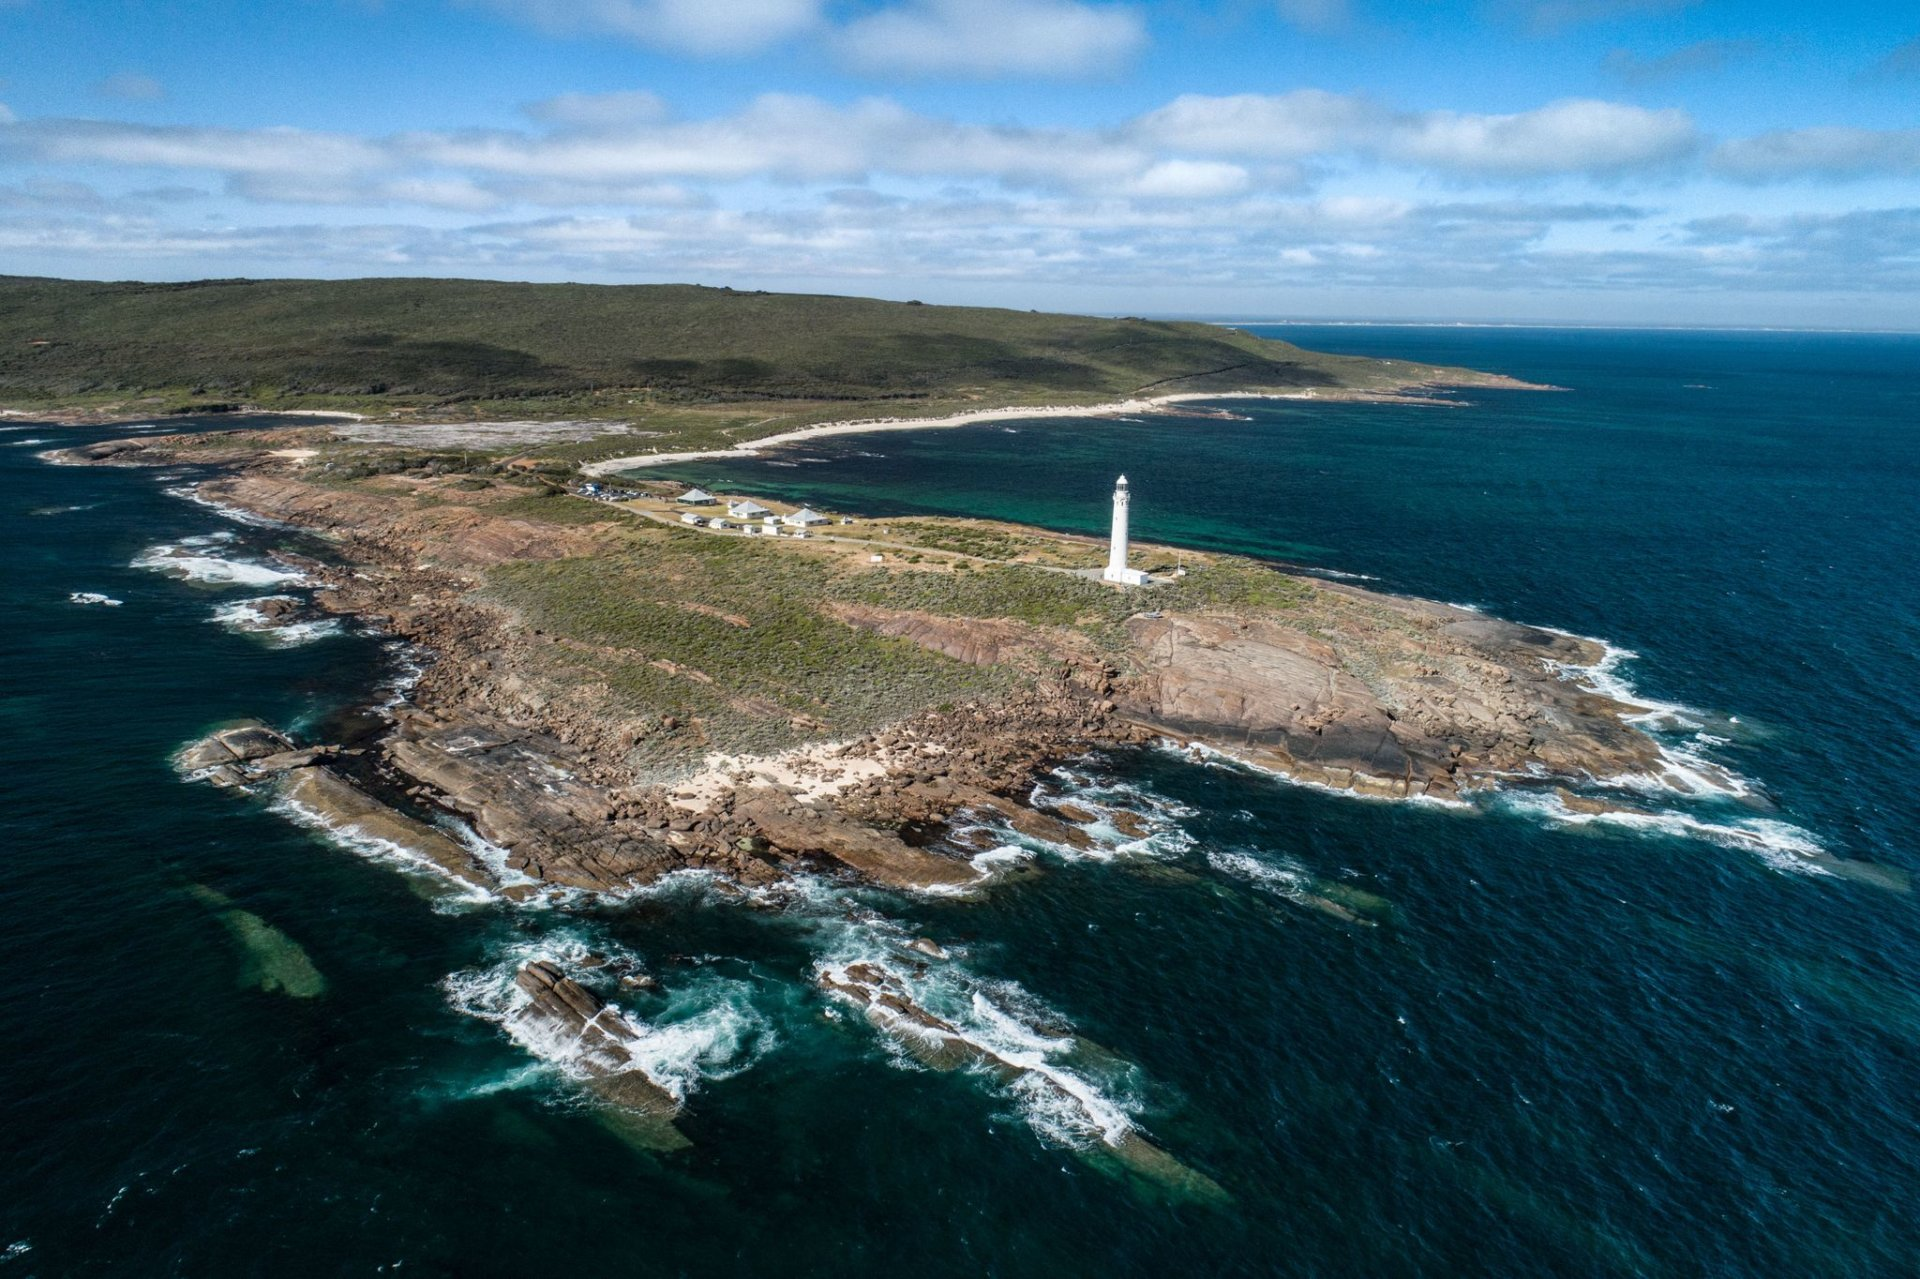 Cape Leeuwin Lighthouse Works